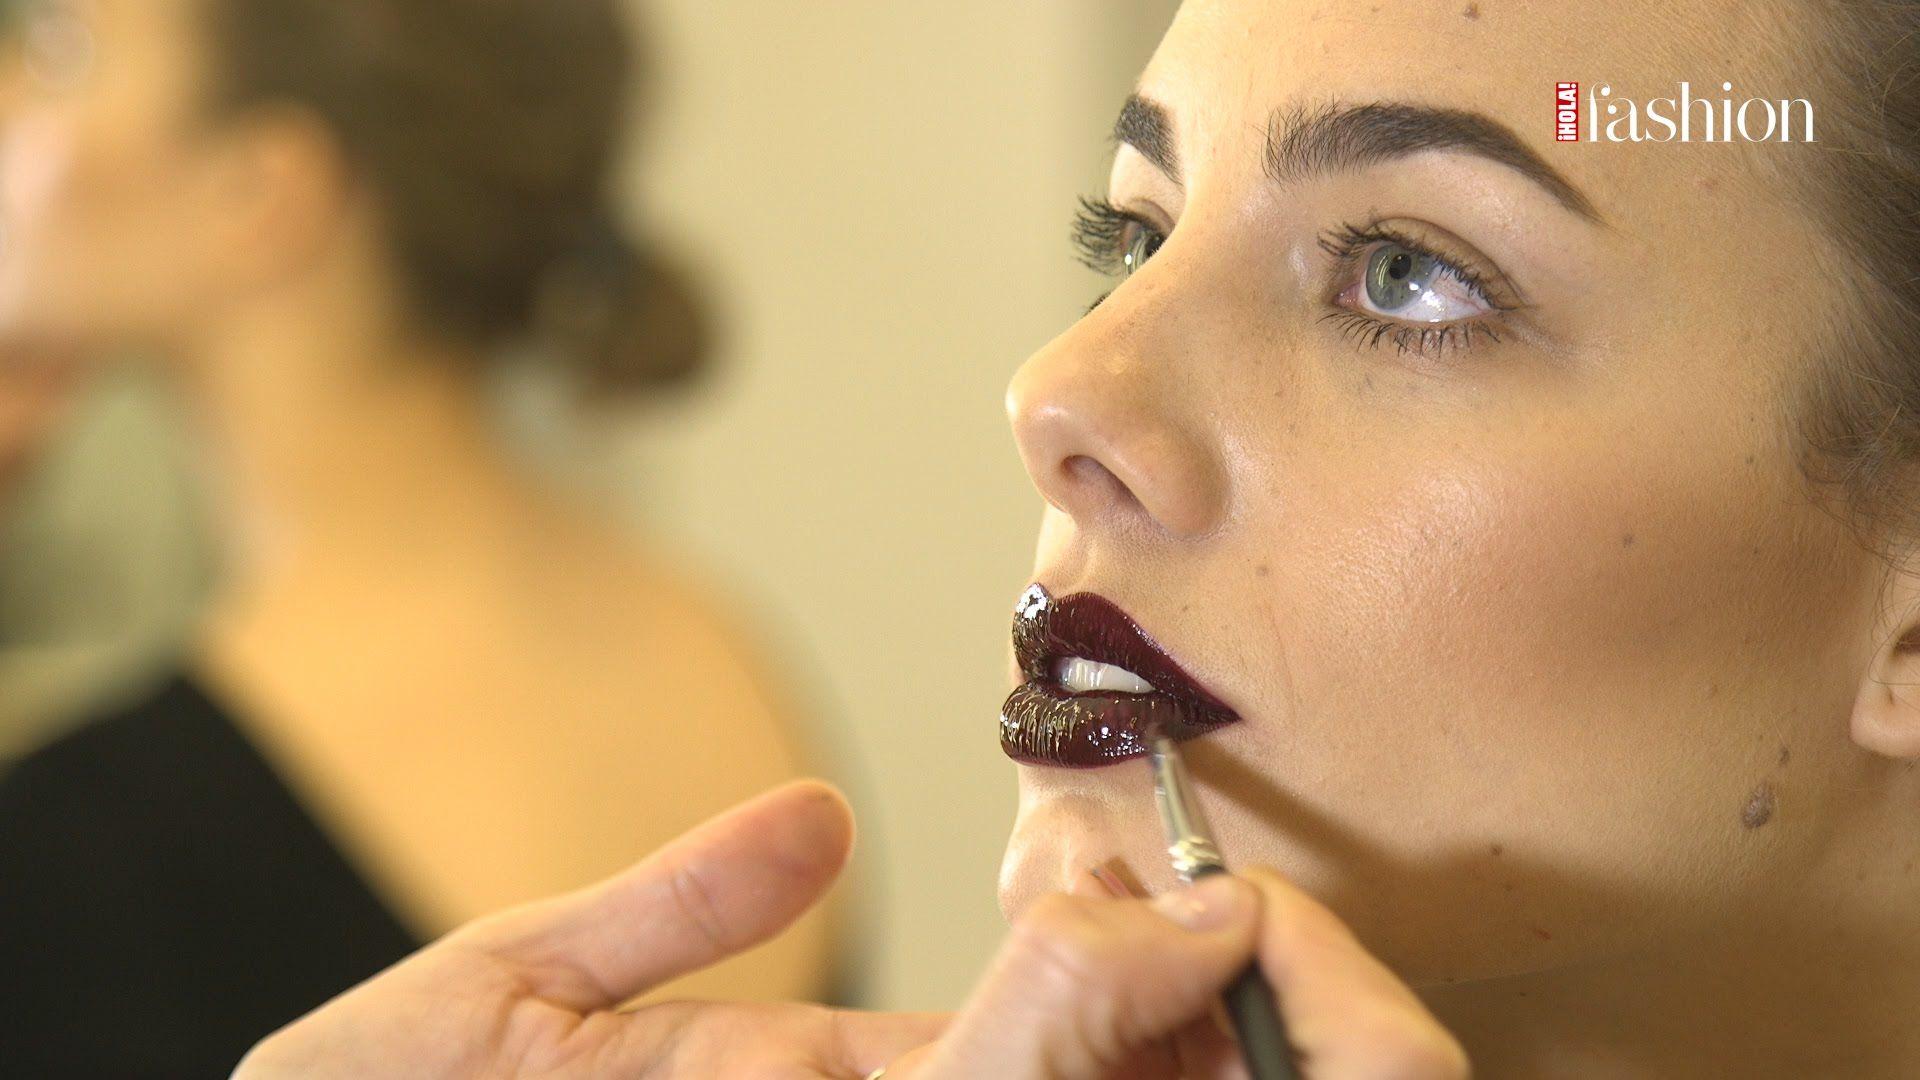 Paso a paso: ¿Cómo lucir unos labios oscuros?  – Maquillaje